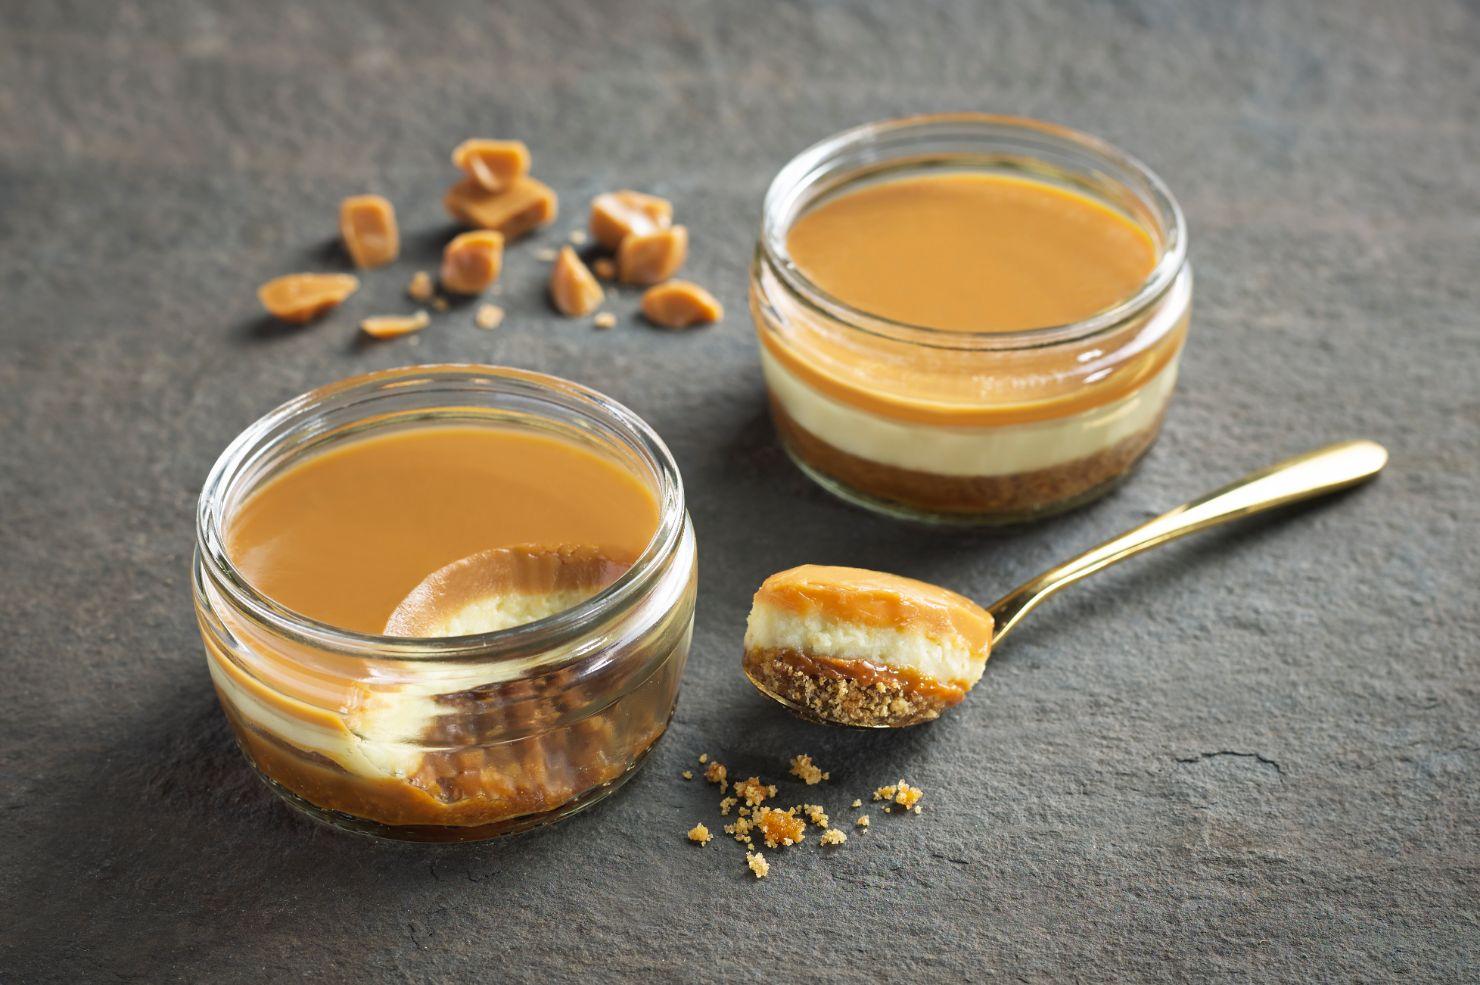 Gü Salted Caramel Cheesecake